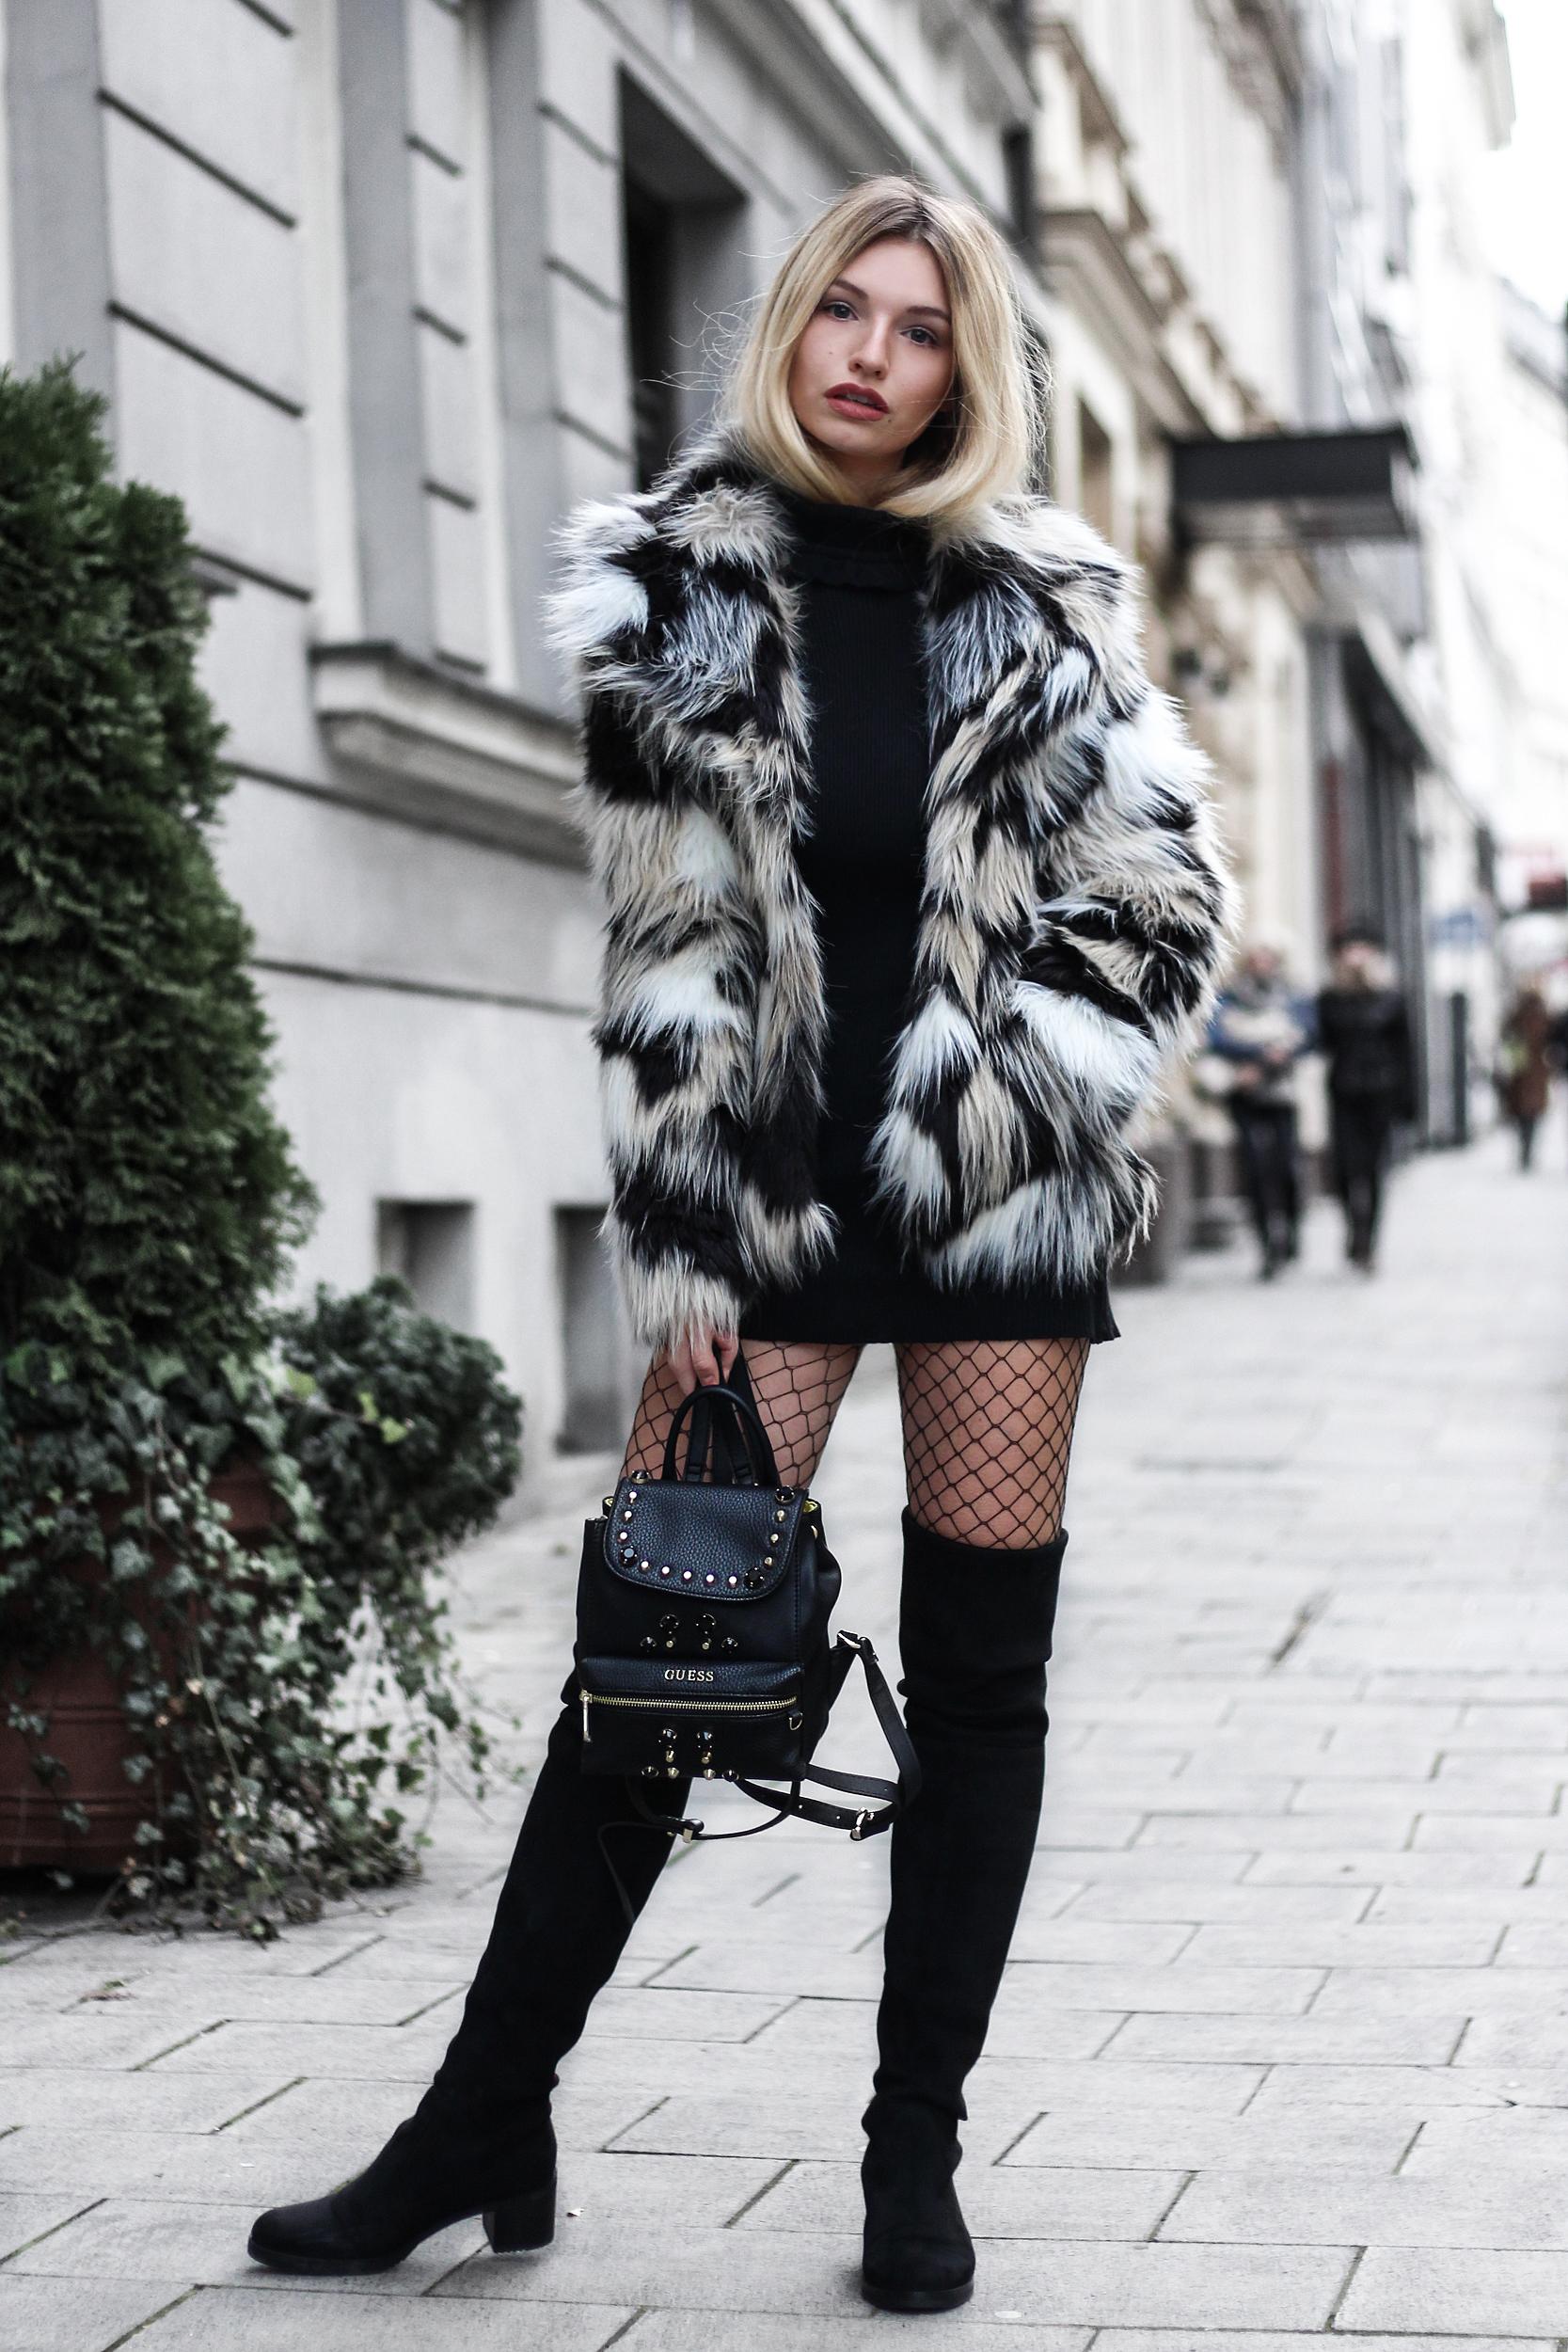 franziska-elea-blogger-aus-muenchen-fake-fur-jacke-netzstrumpfhose-overknee-stiefel-guess-rucksack-mit-nieten-fashionblogger-modeblog-herbst